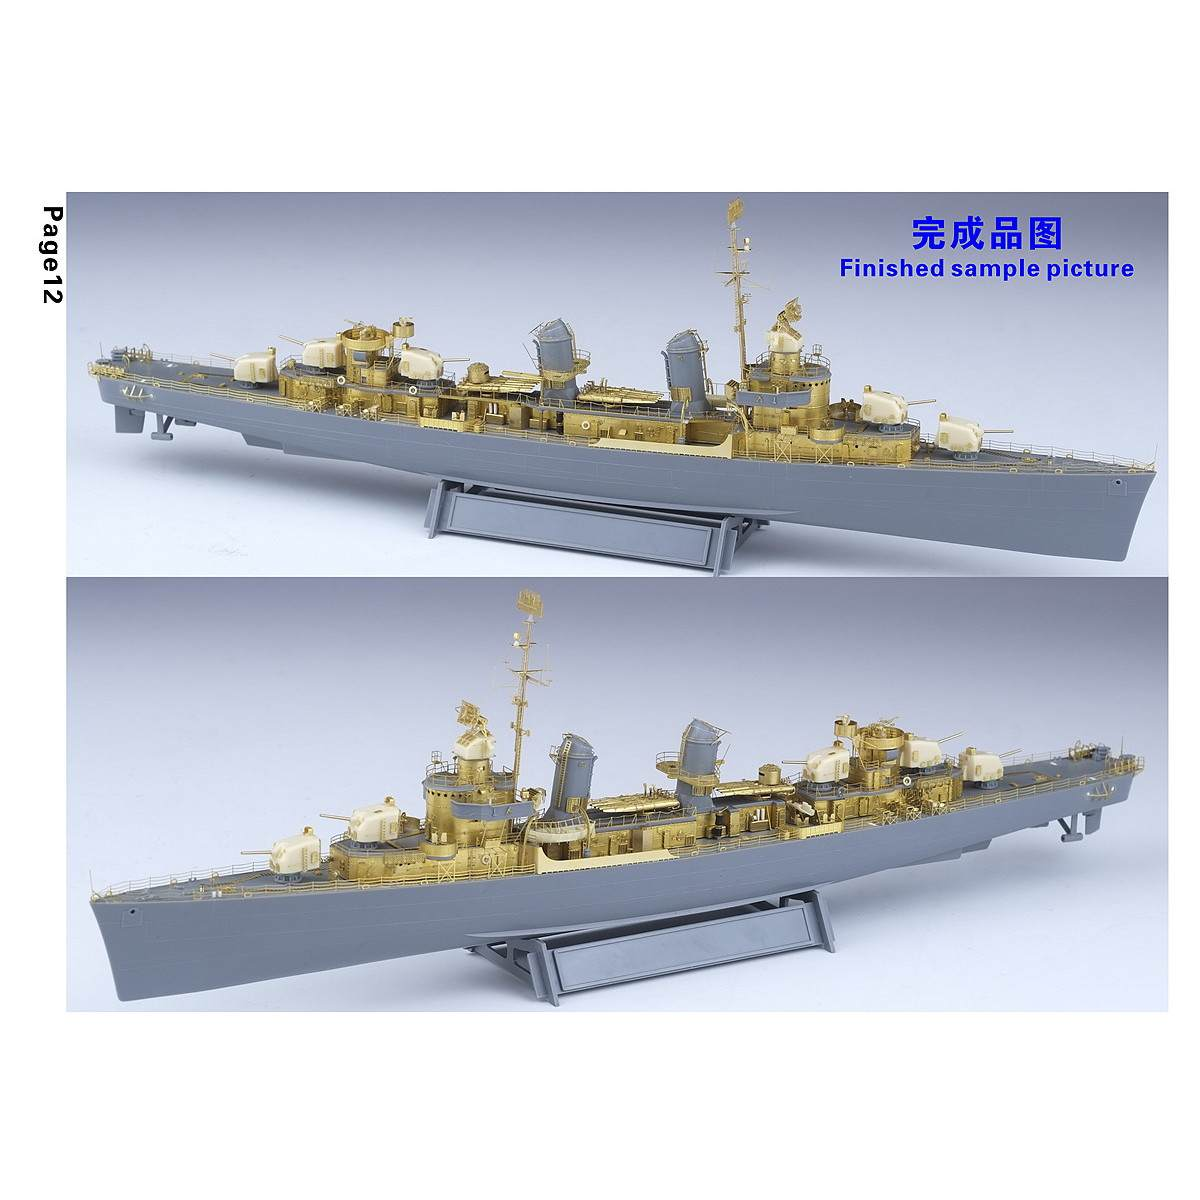 FS350064 米海軍 フレッチャー級駆逐艦 コンプリートアップグレートセット